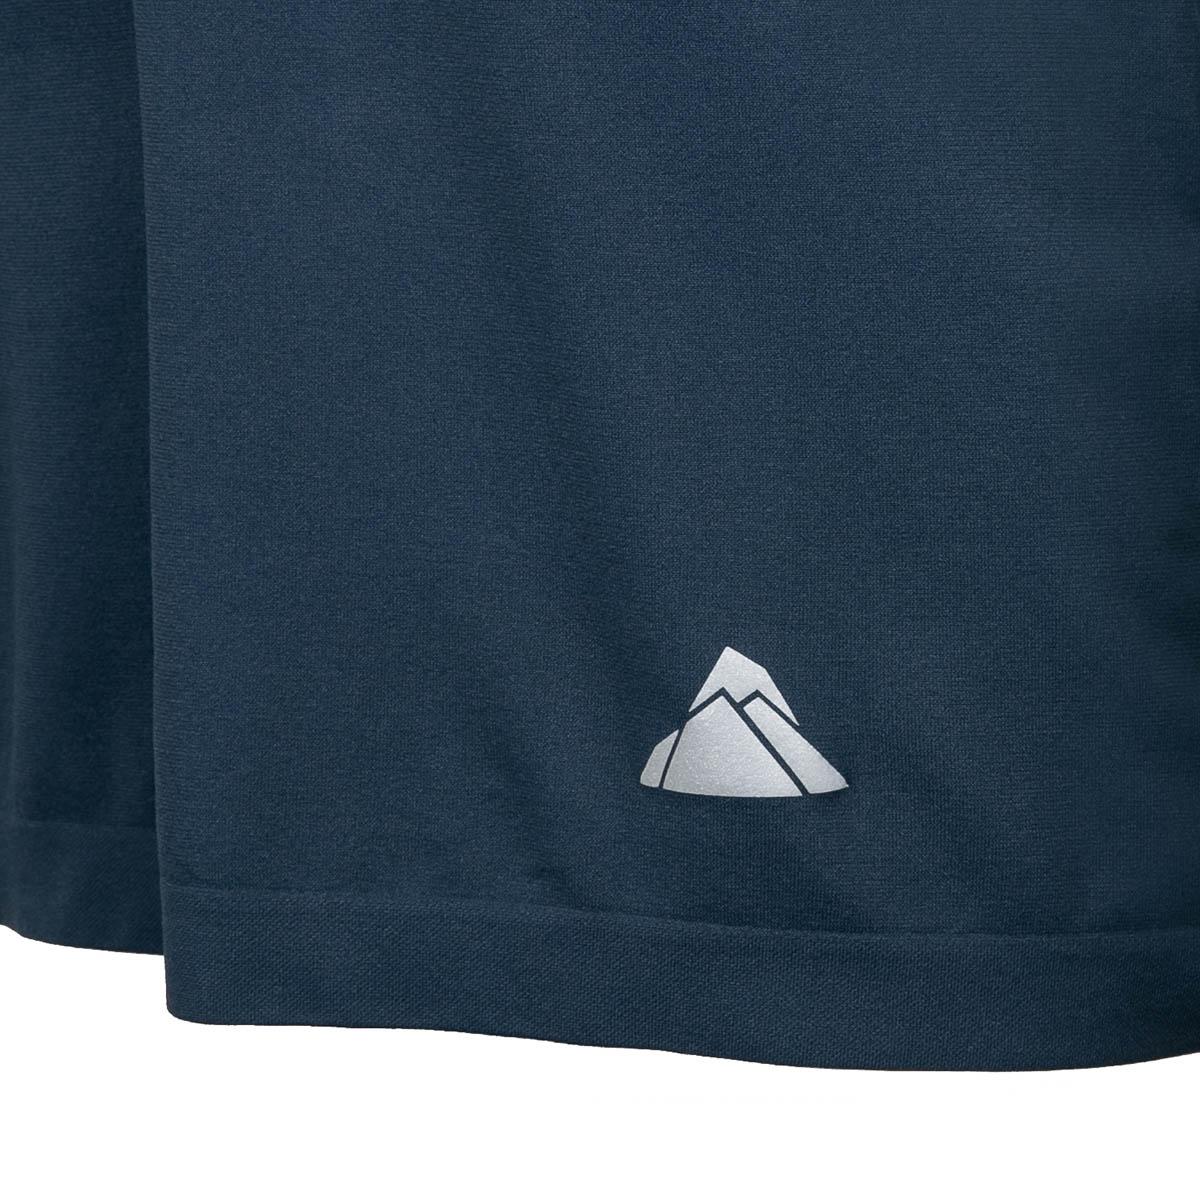 Maloja Tech Shirt Lake CloM. Mountain Lake Shirt 6f21b1